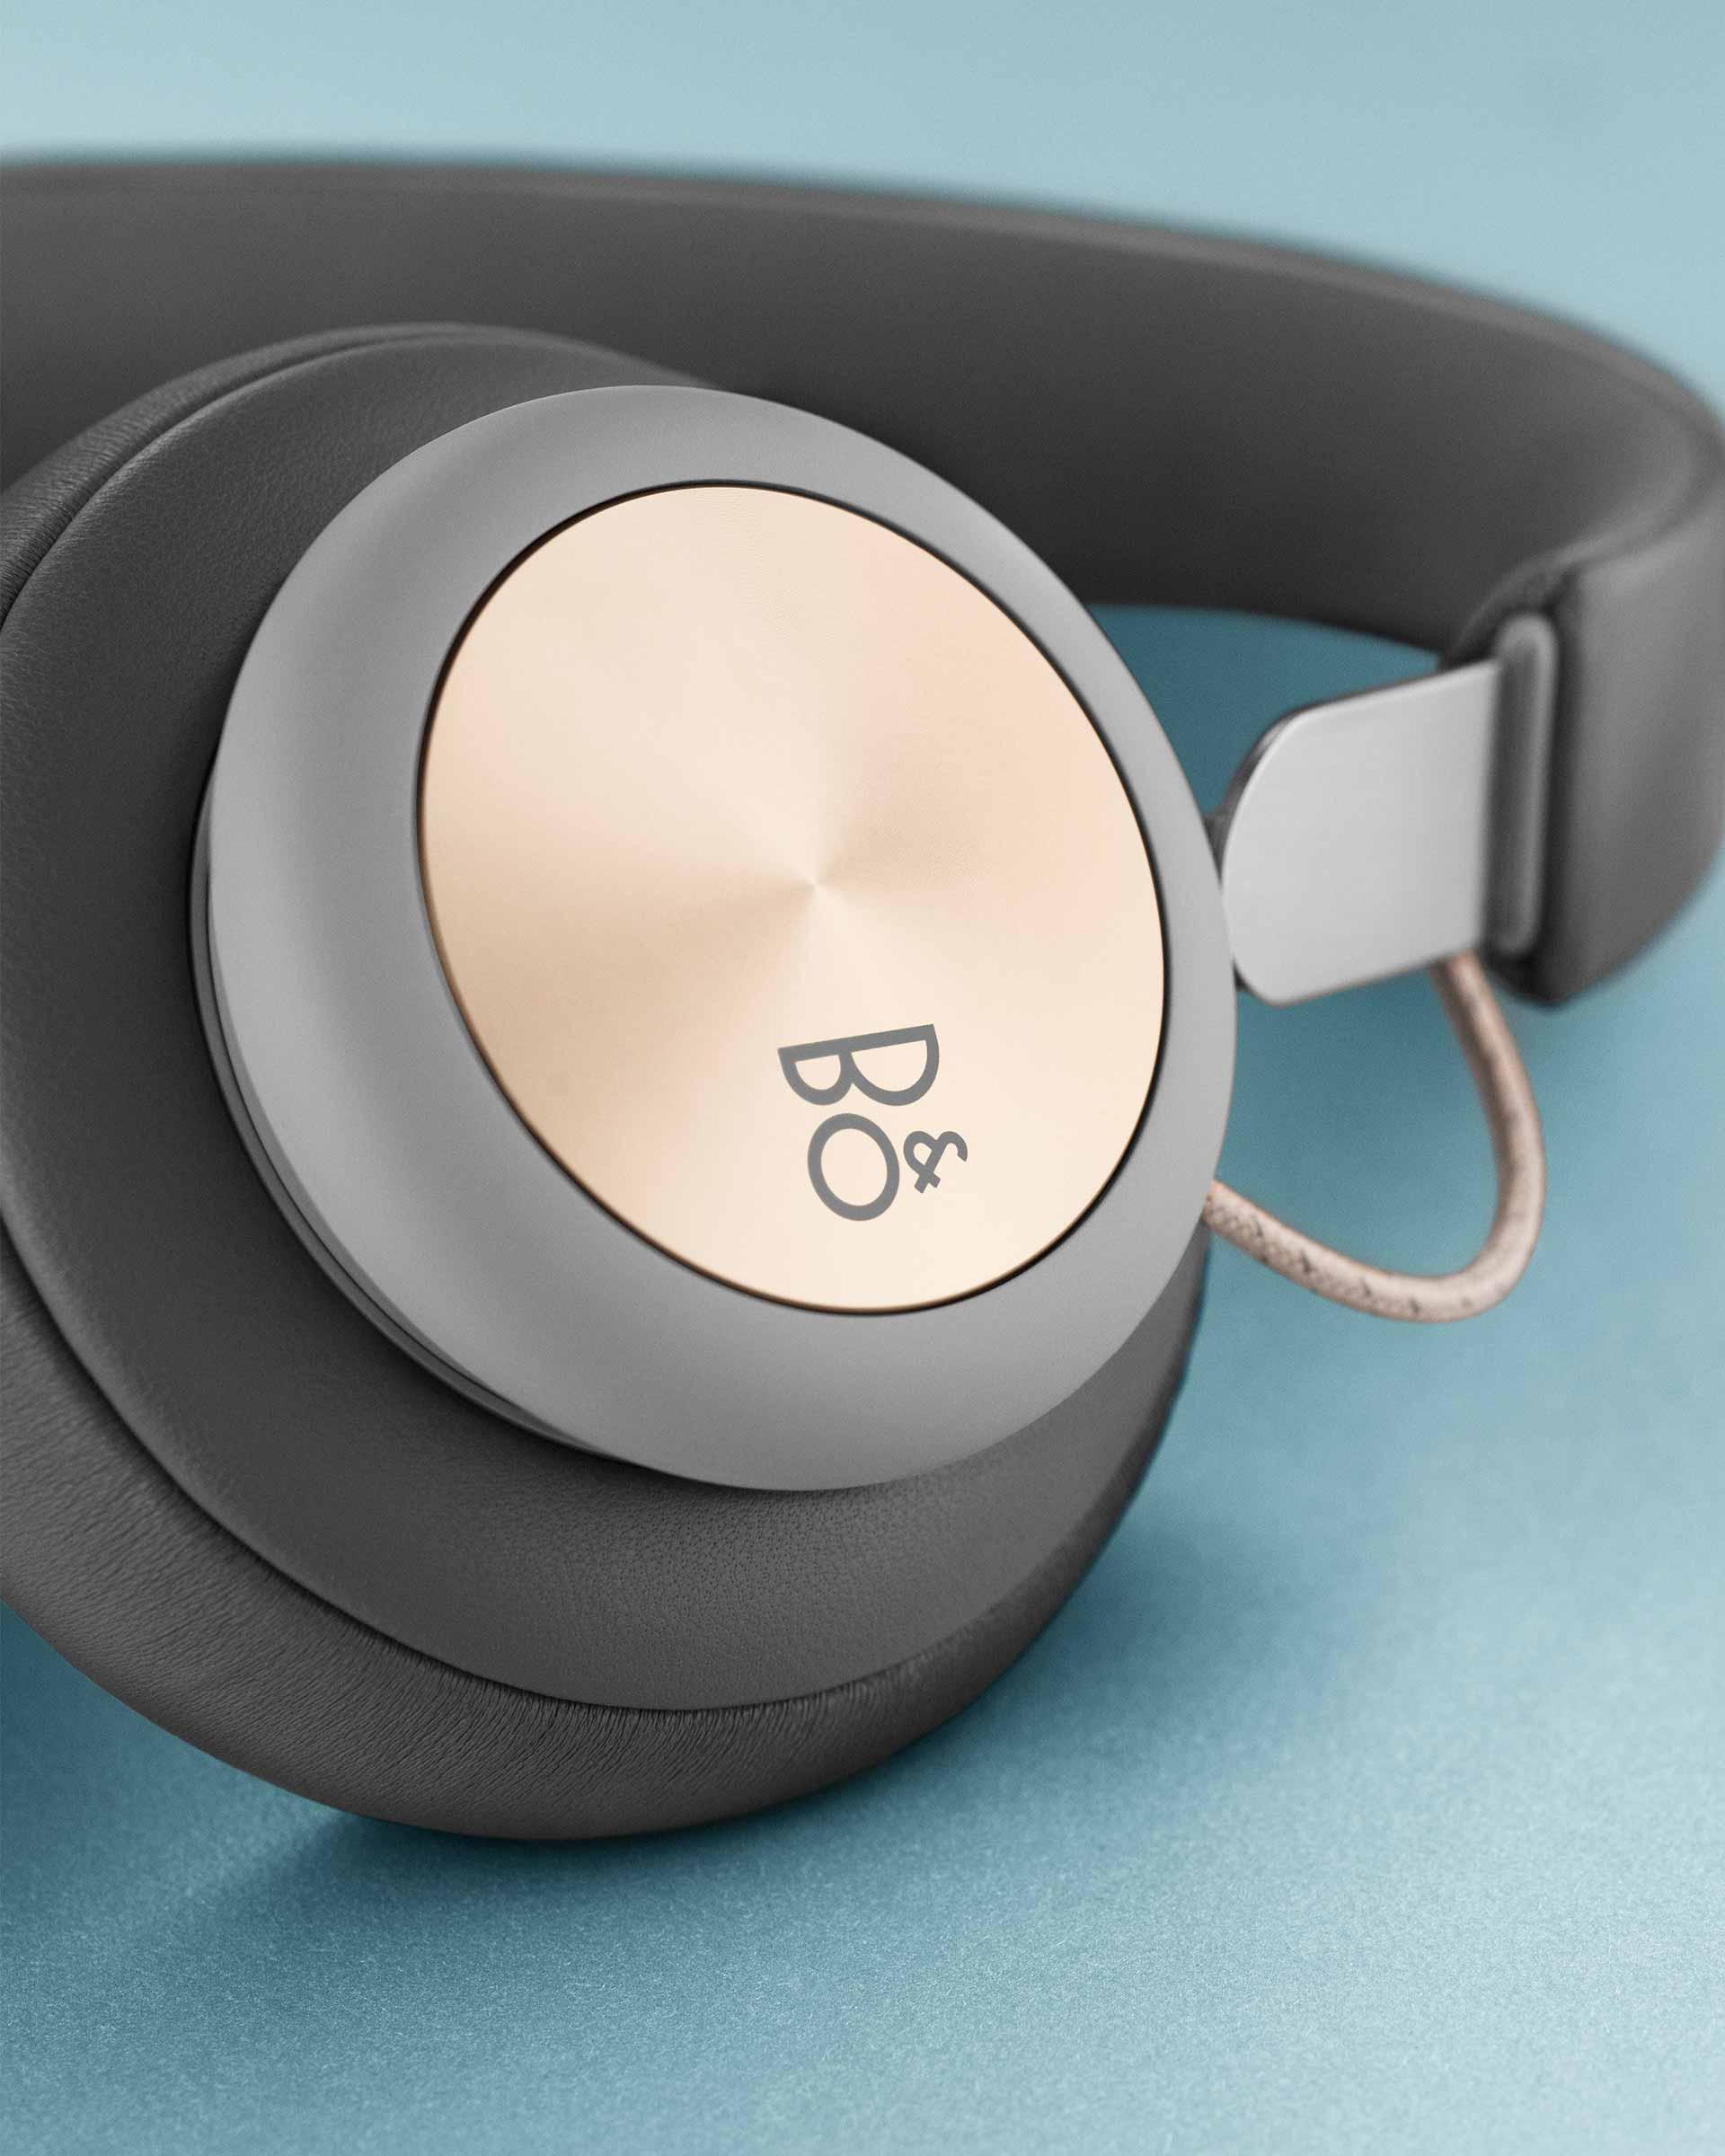 30e5c74eba1 Beoplay H4 - Over-ear headphones